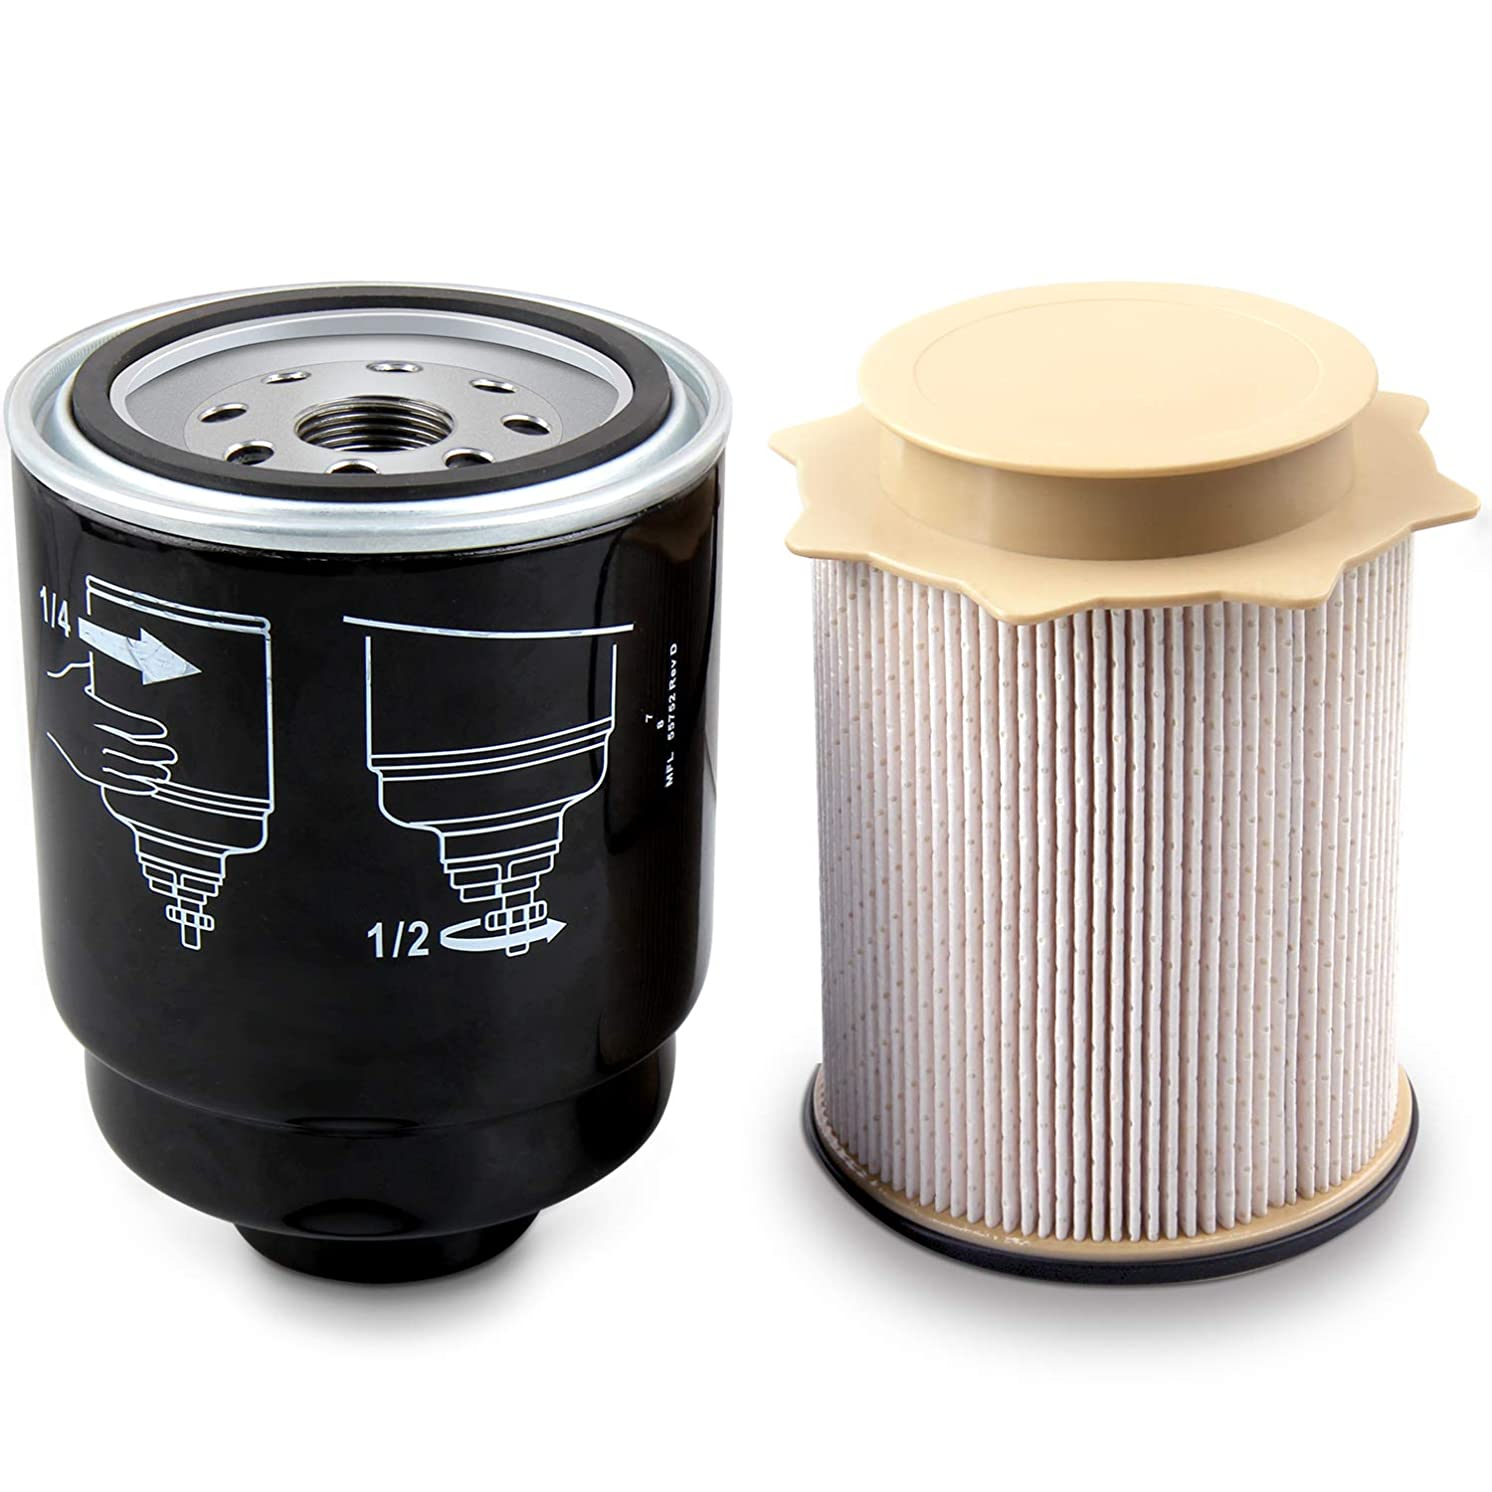 Auto Safety Diesel Fuel Filter Water Separator set for Dodge Ram 6.7L 2500 3500 4500 5500 6.7L Cummins Turbo Diesel Engines 68197867AA 68157291AA